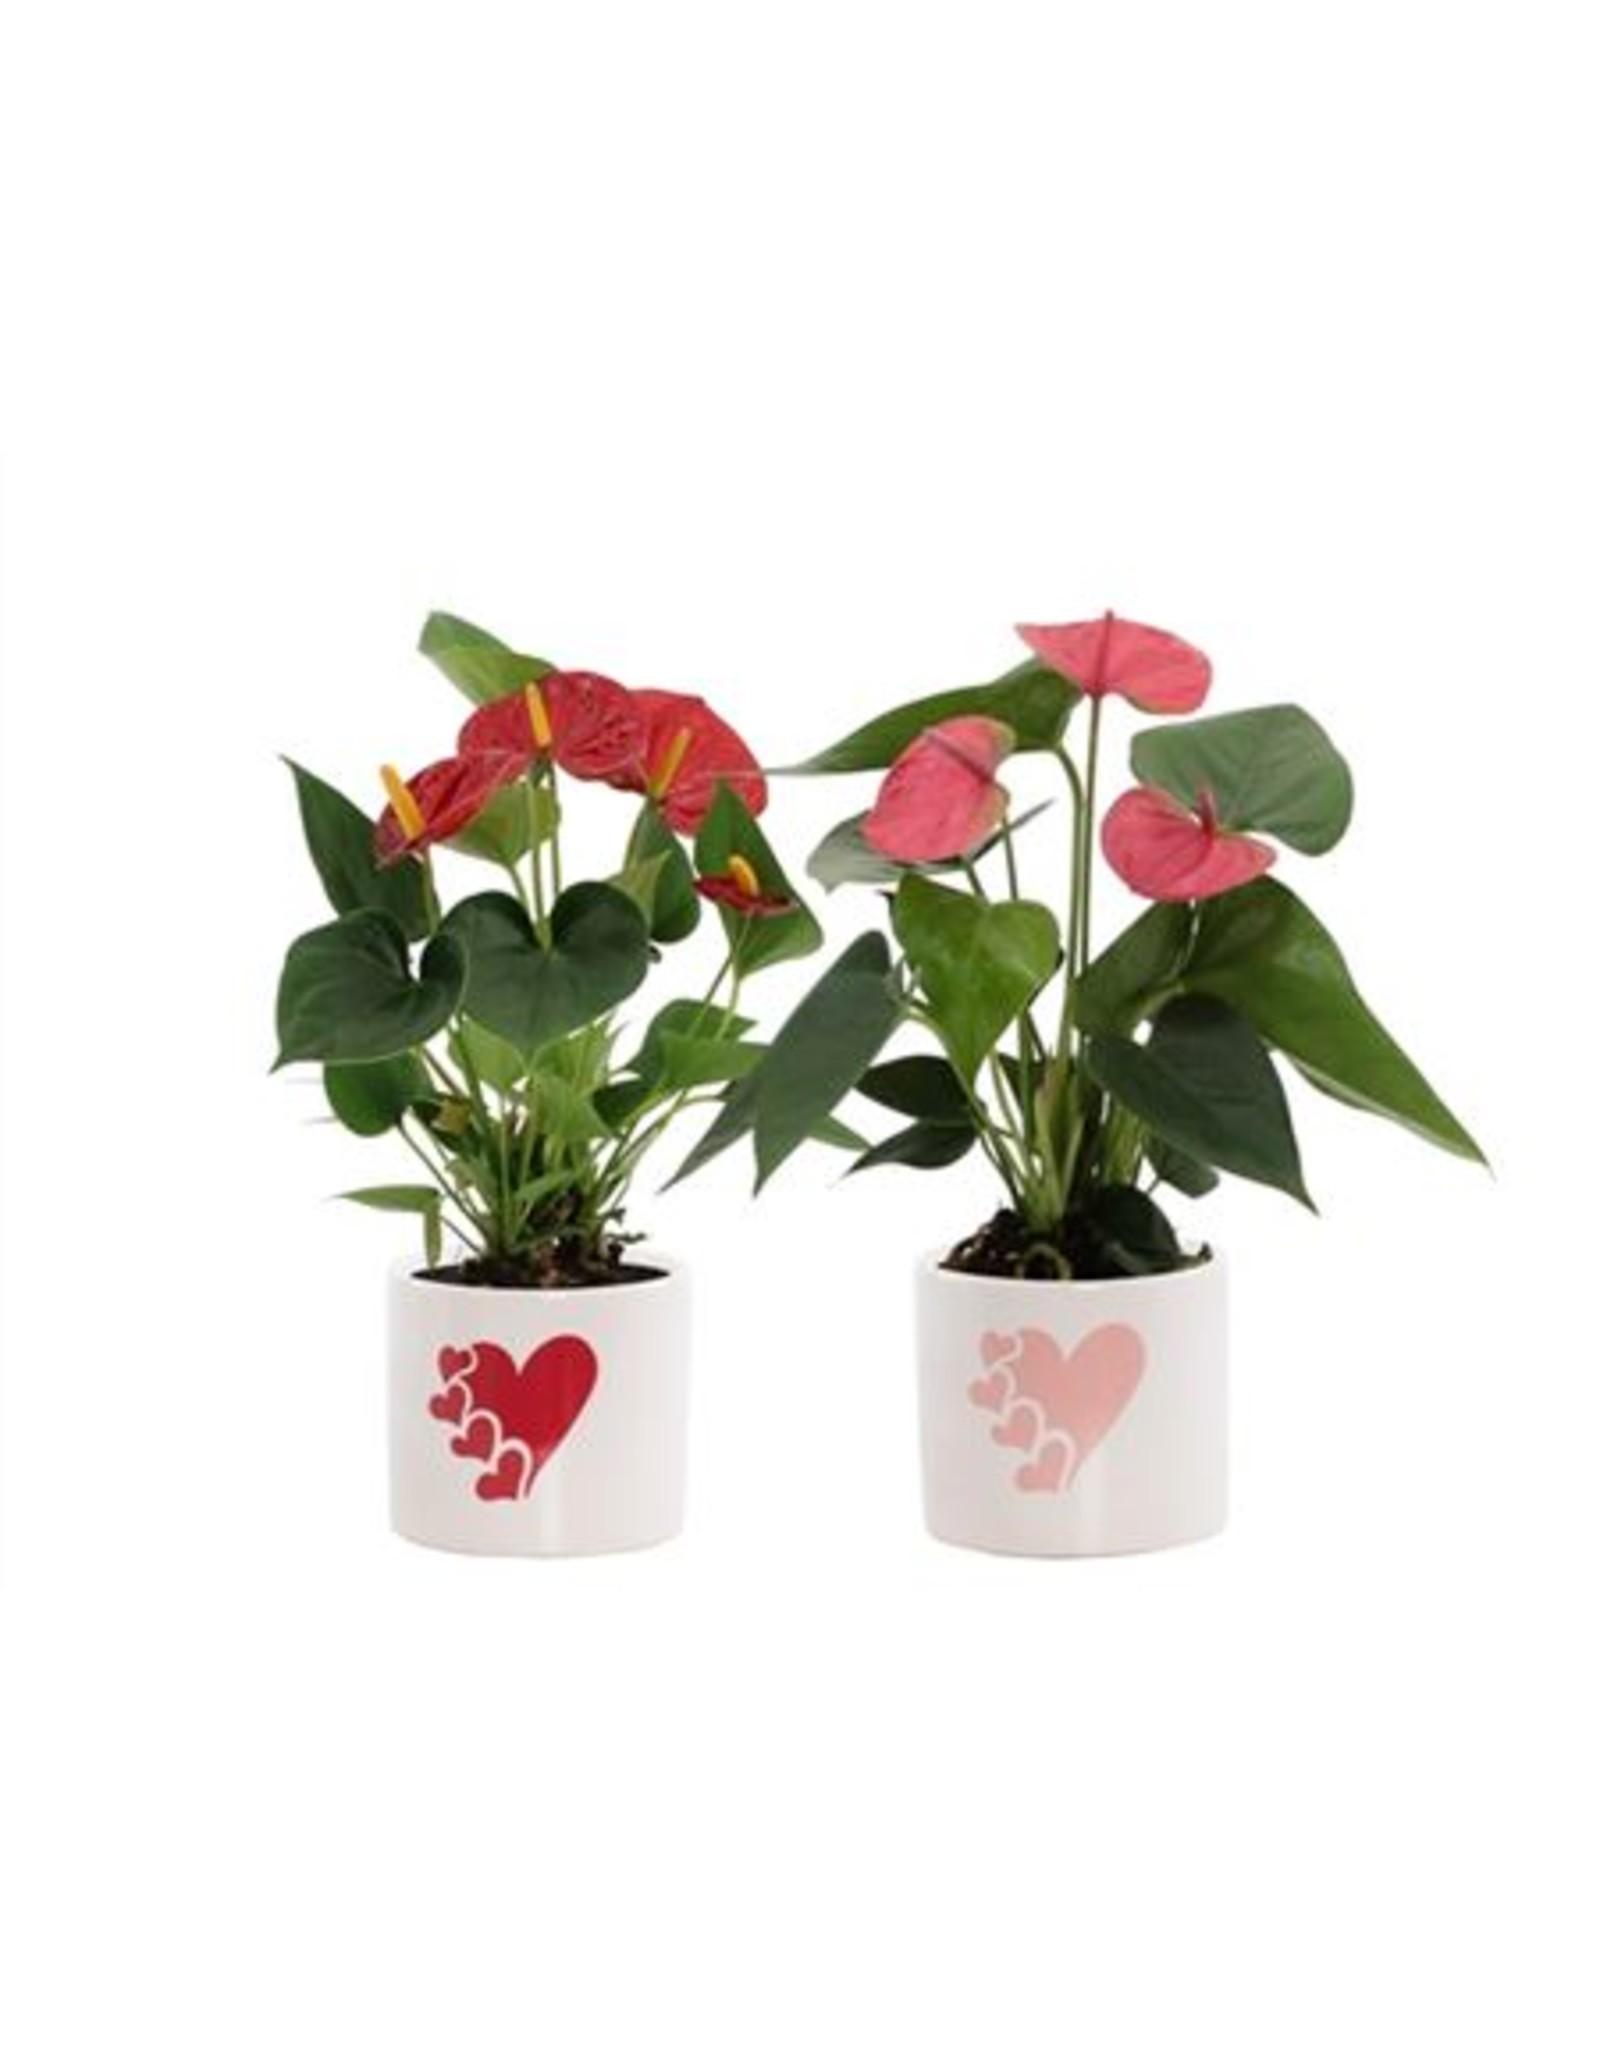 VDP Anthurium Rood-roze Mix In Fien Keramiek - Soft Il x 8